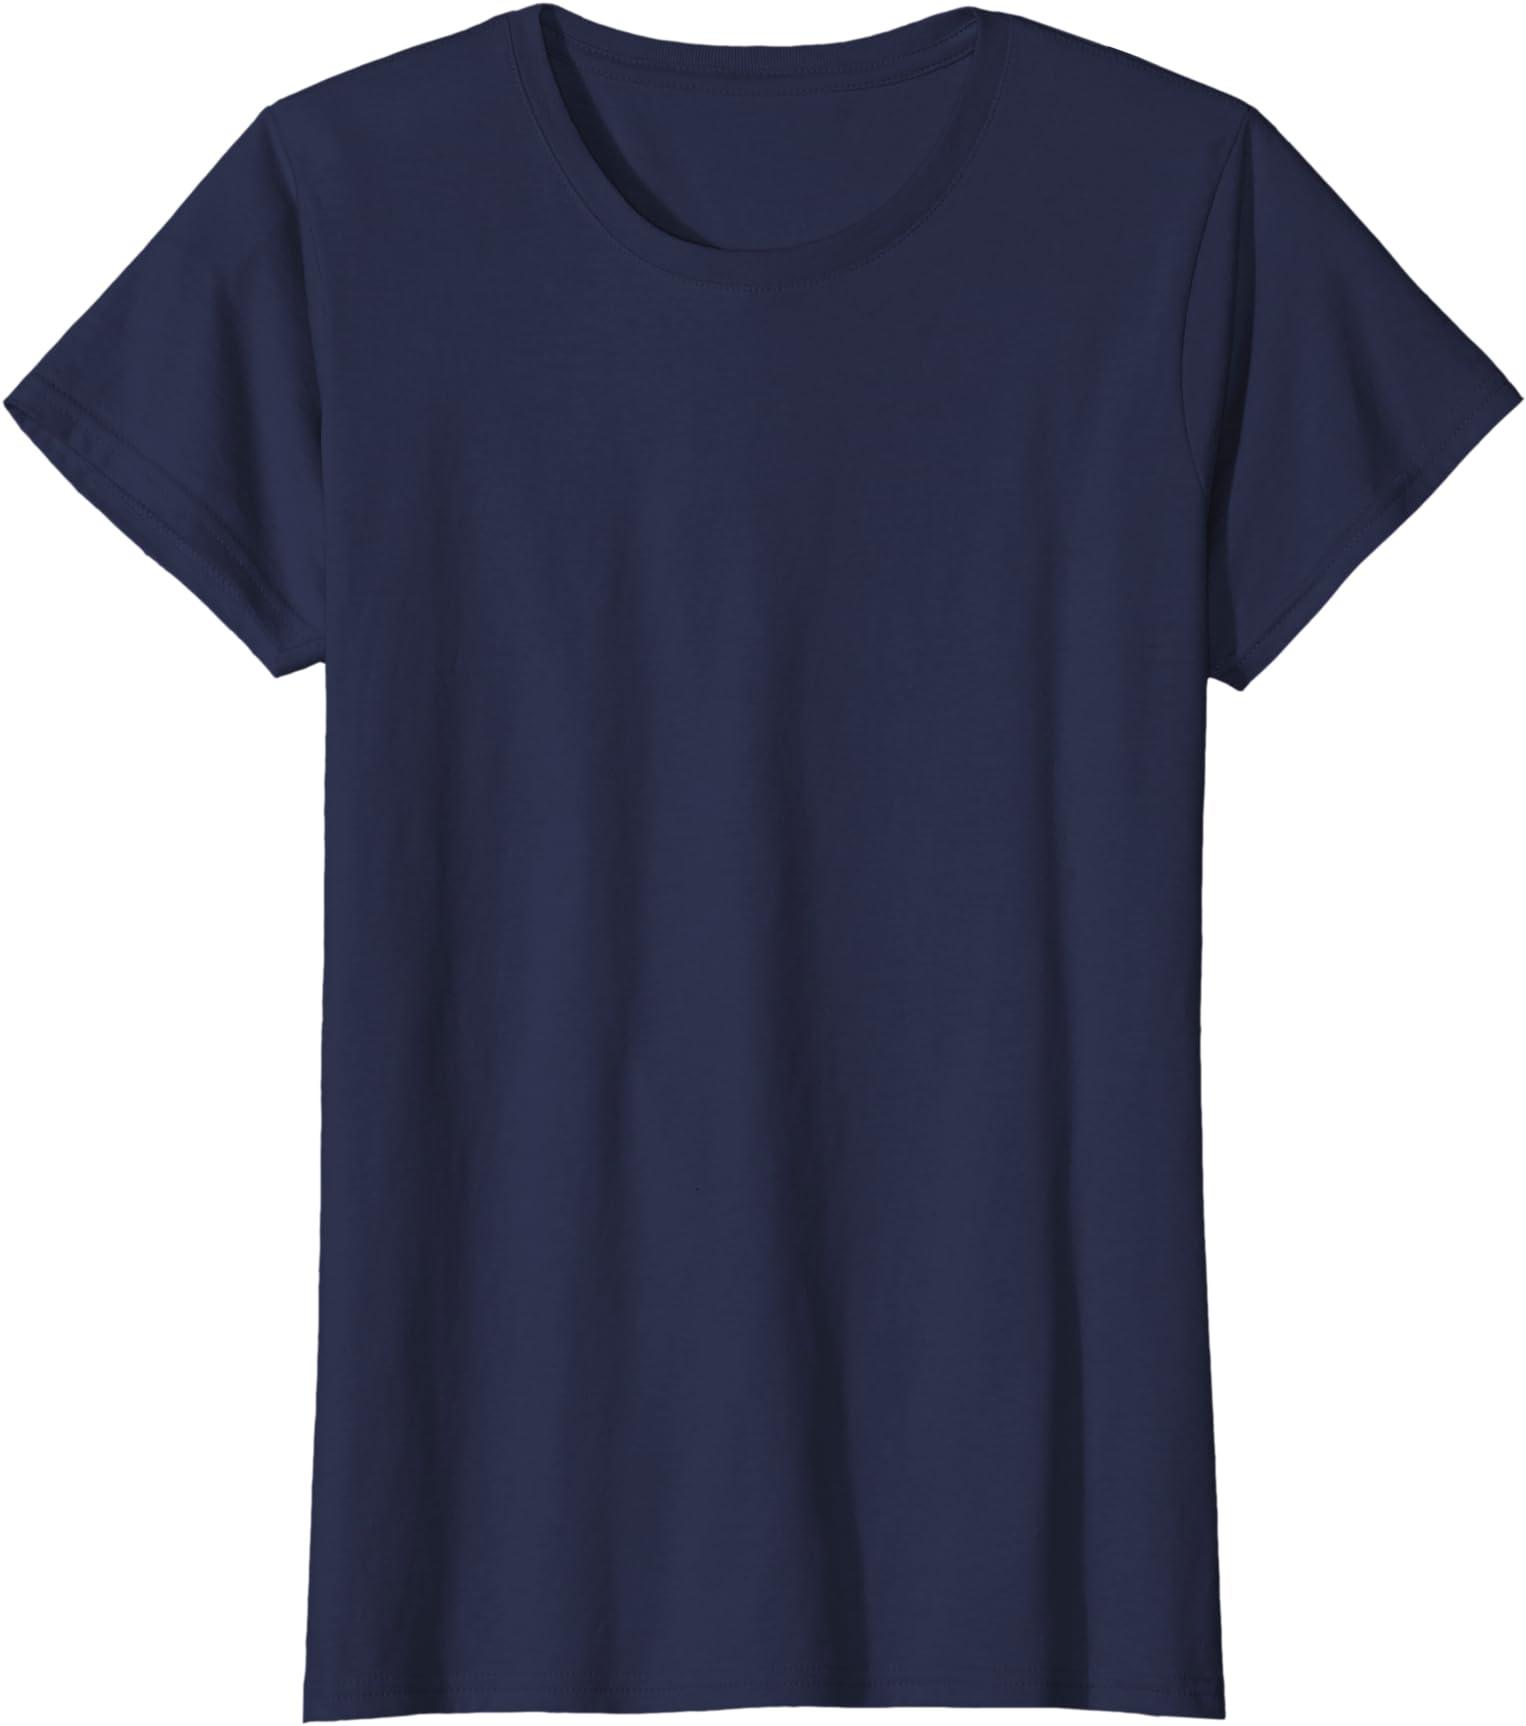 friday the 13th thirteenth t shirt jason halloween Horror Mens Top slasher movie